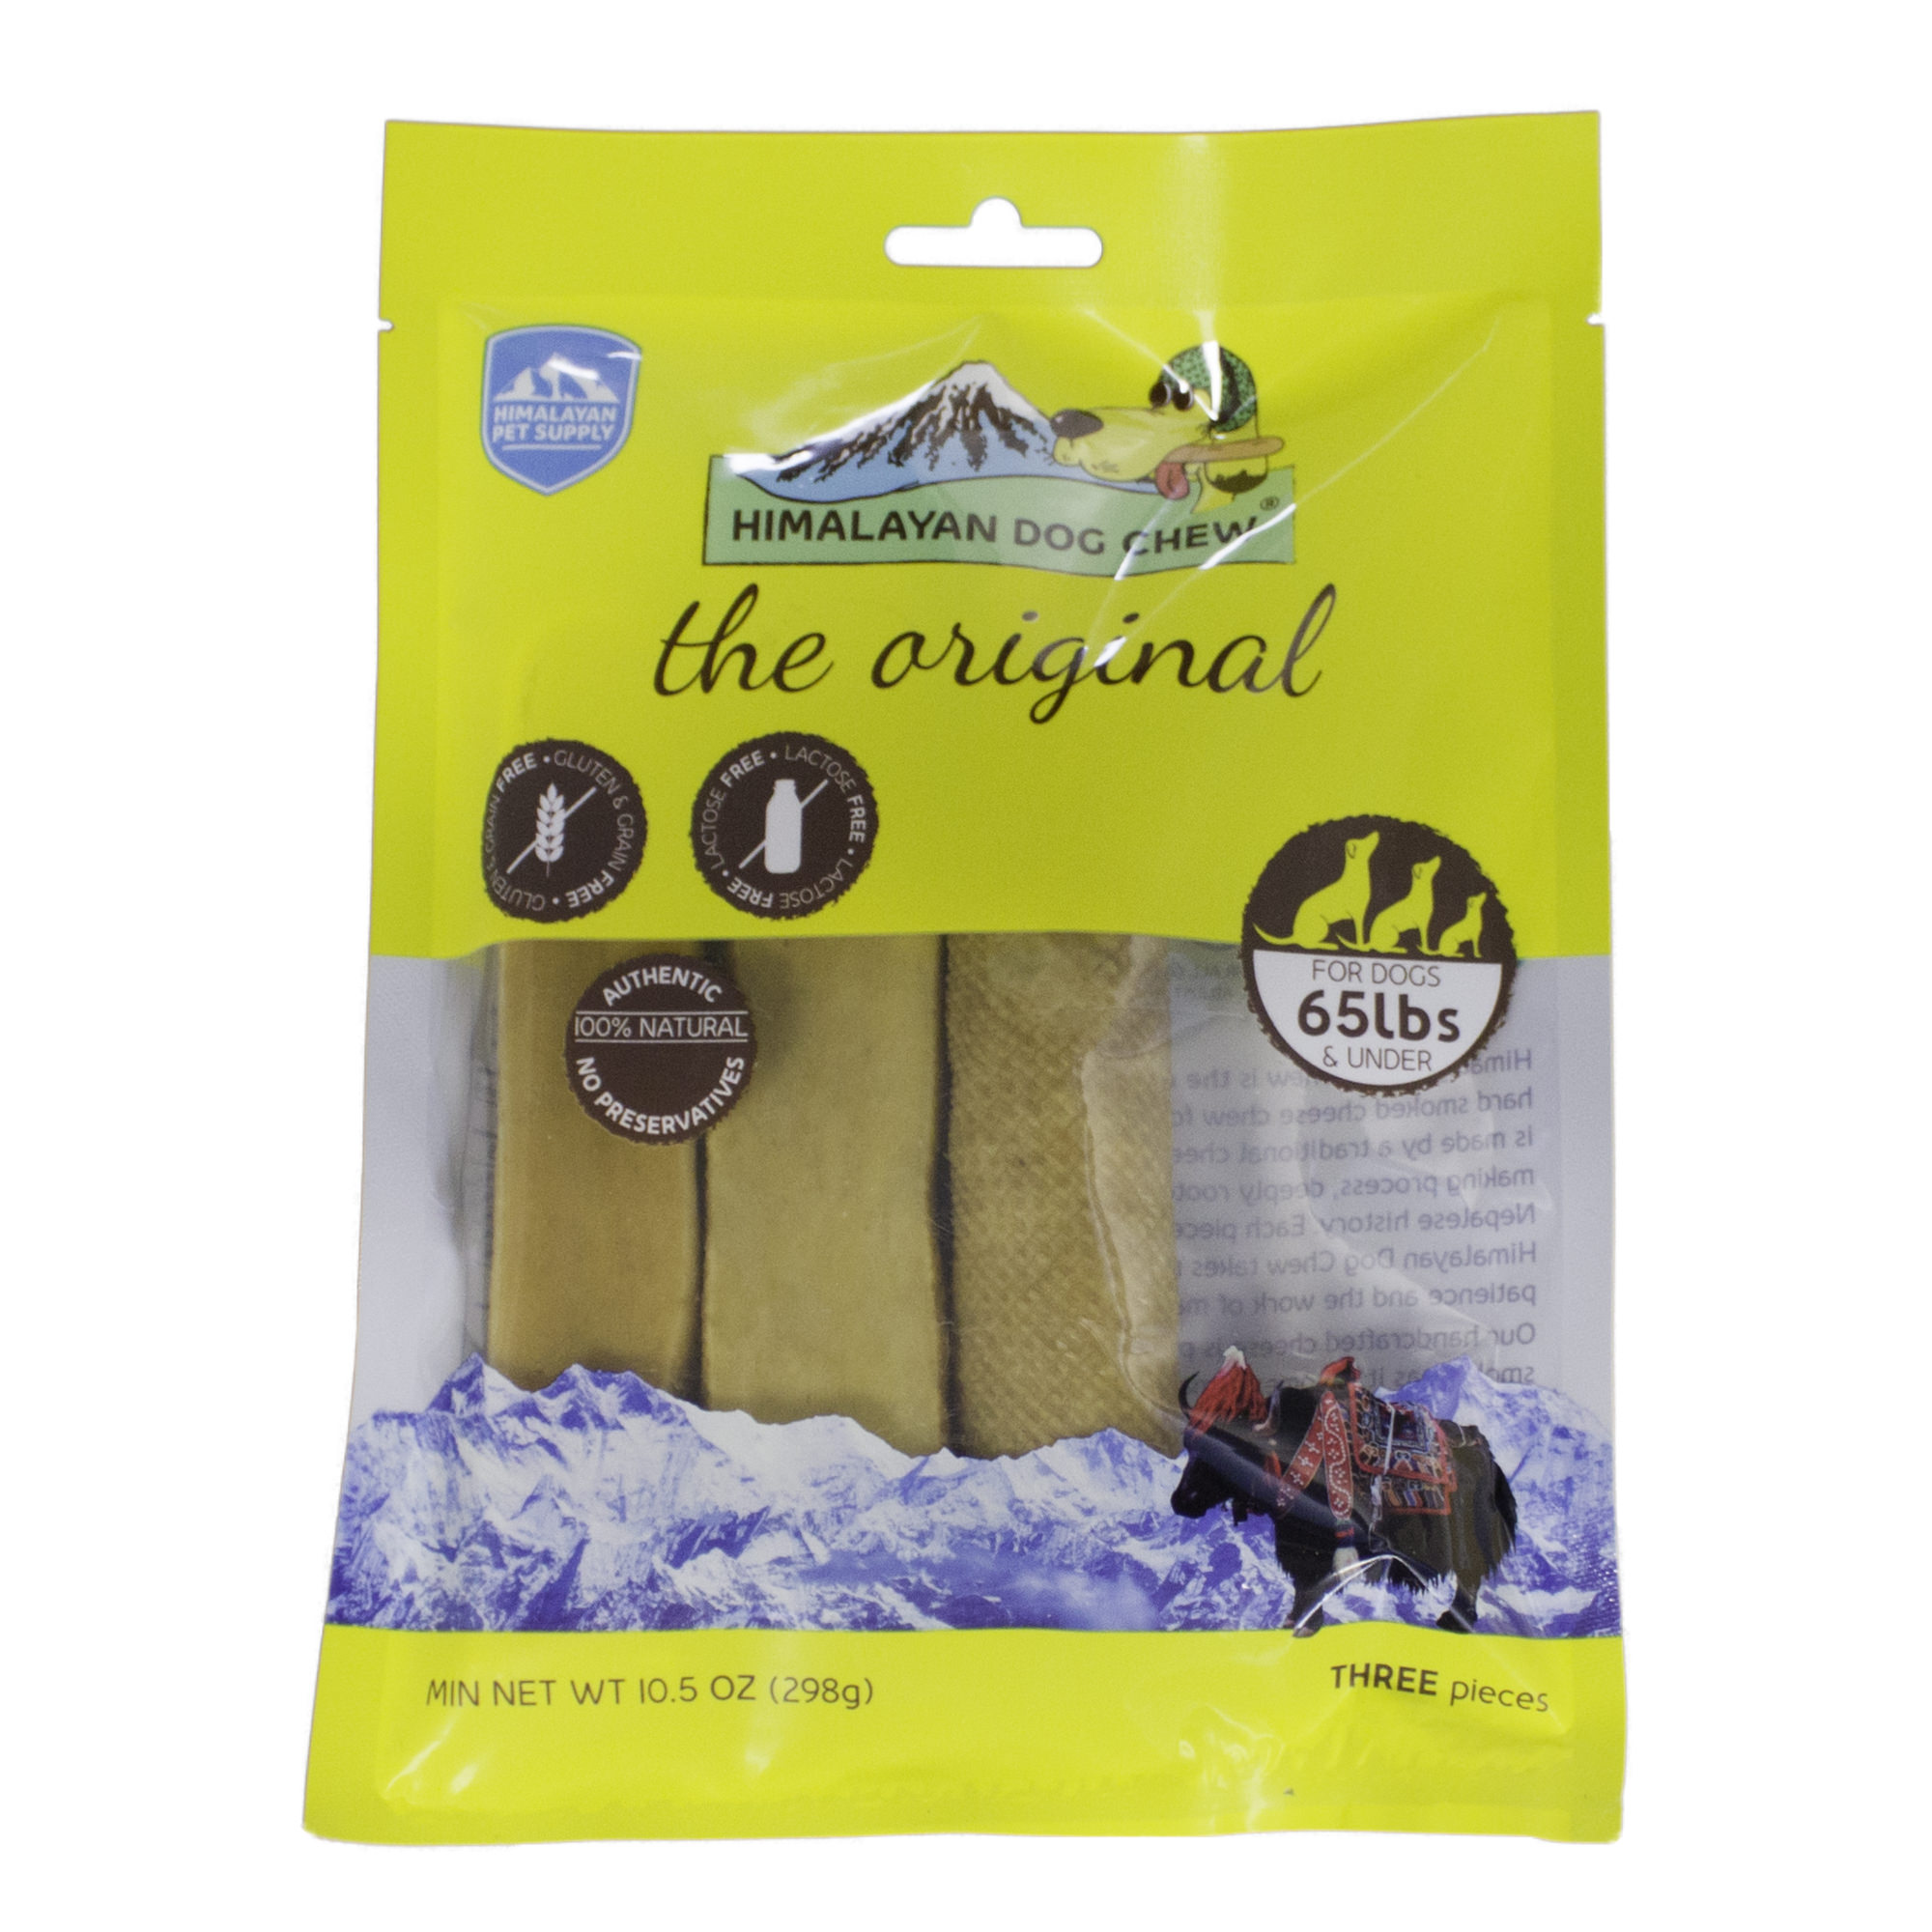 Himalayan Pet Supply; The Original Himalayan Dog Chew for Dogs Under 65 lbs